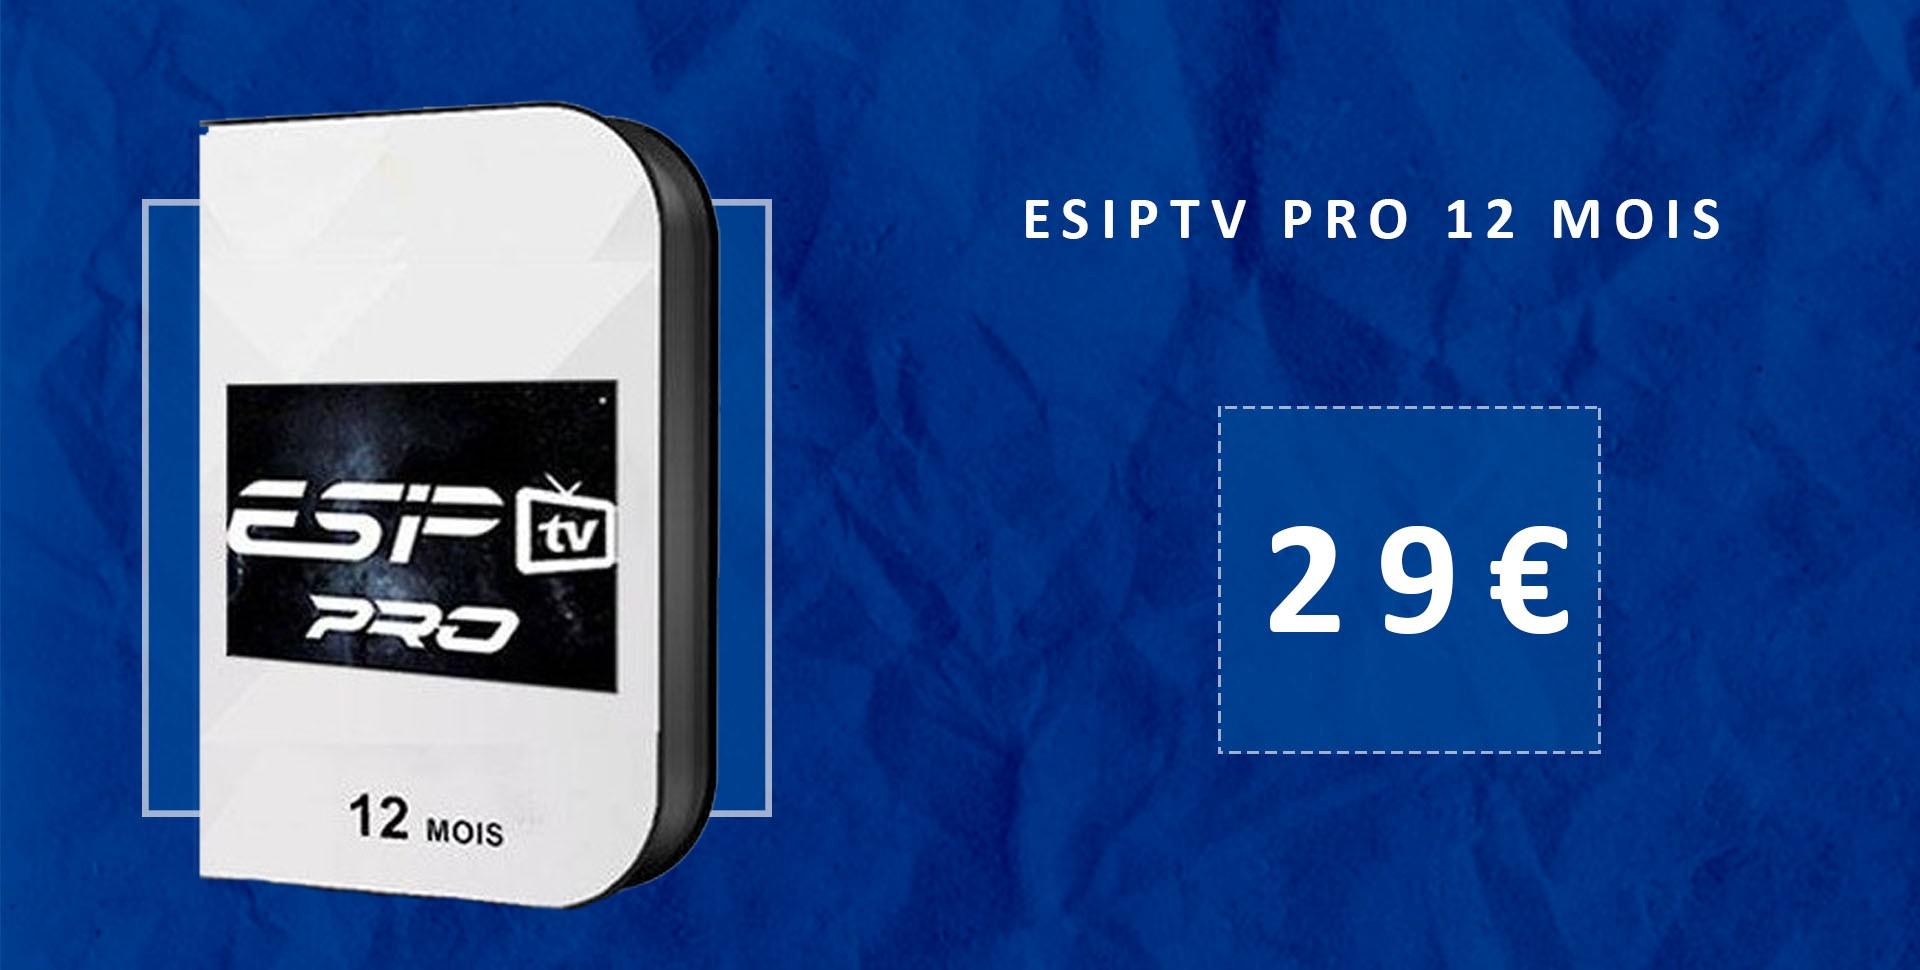 ESIPTV PRO